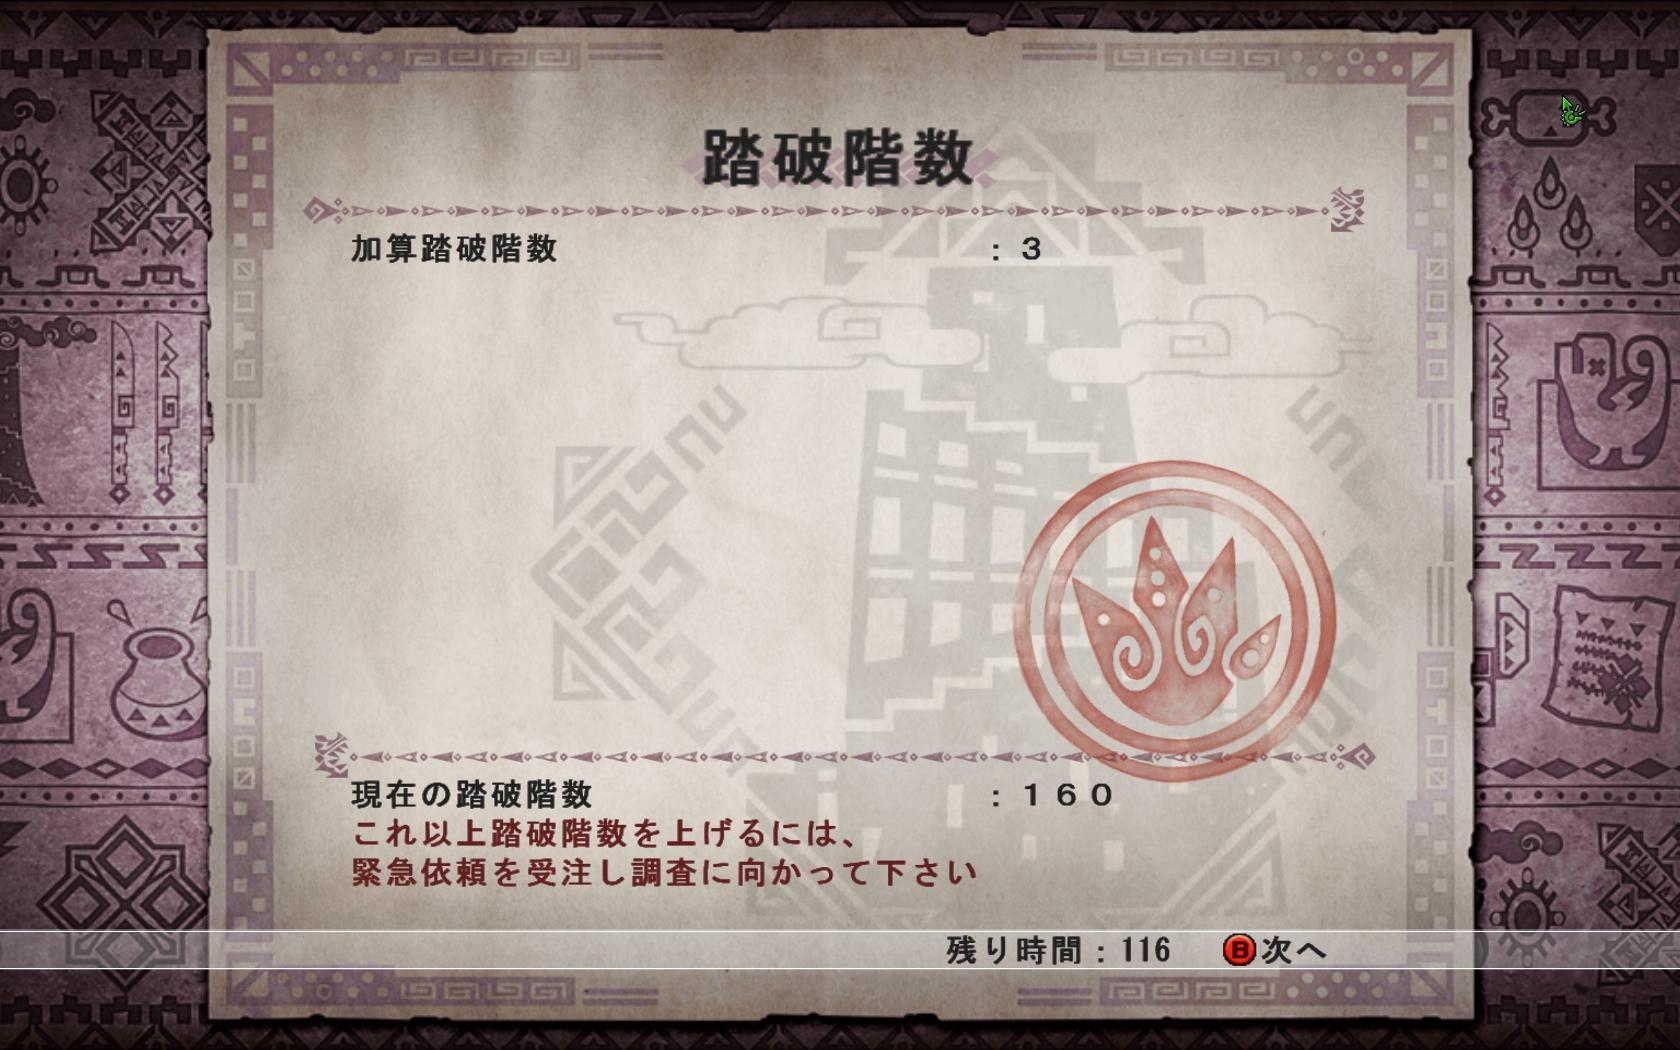 mhf_20151006_143040_004.jpg